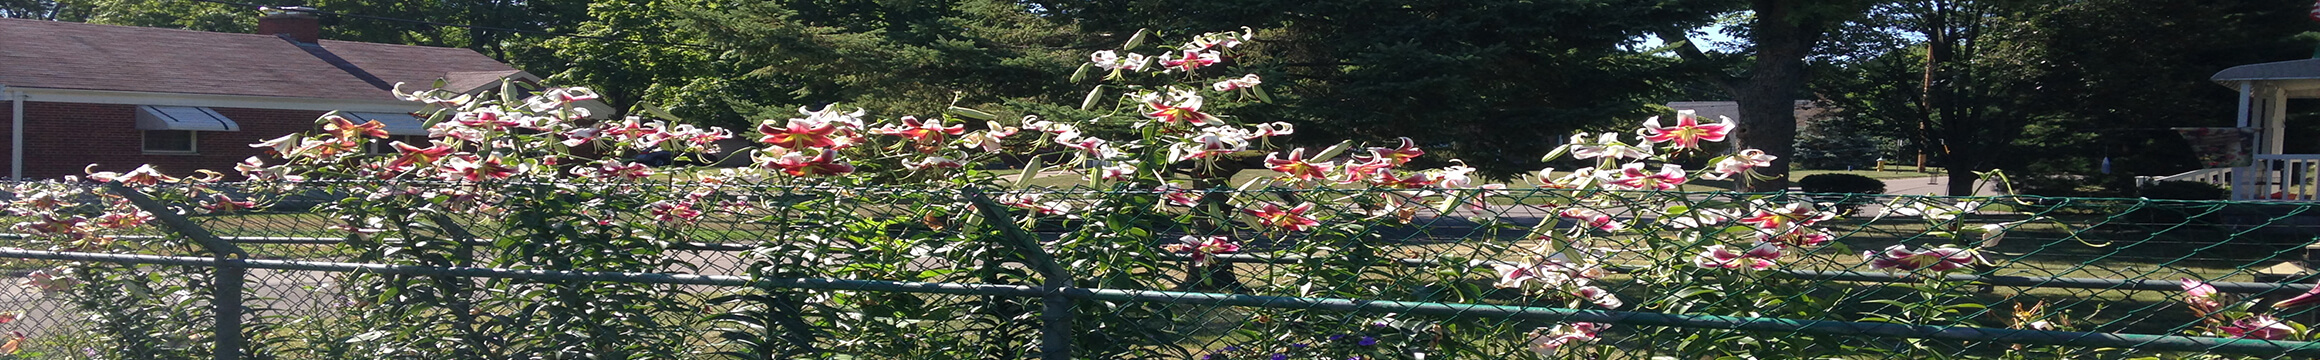 Flowers Cust